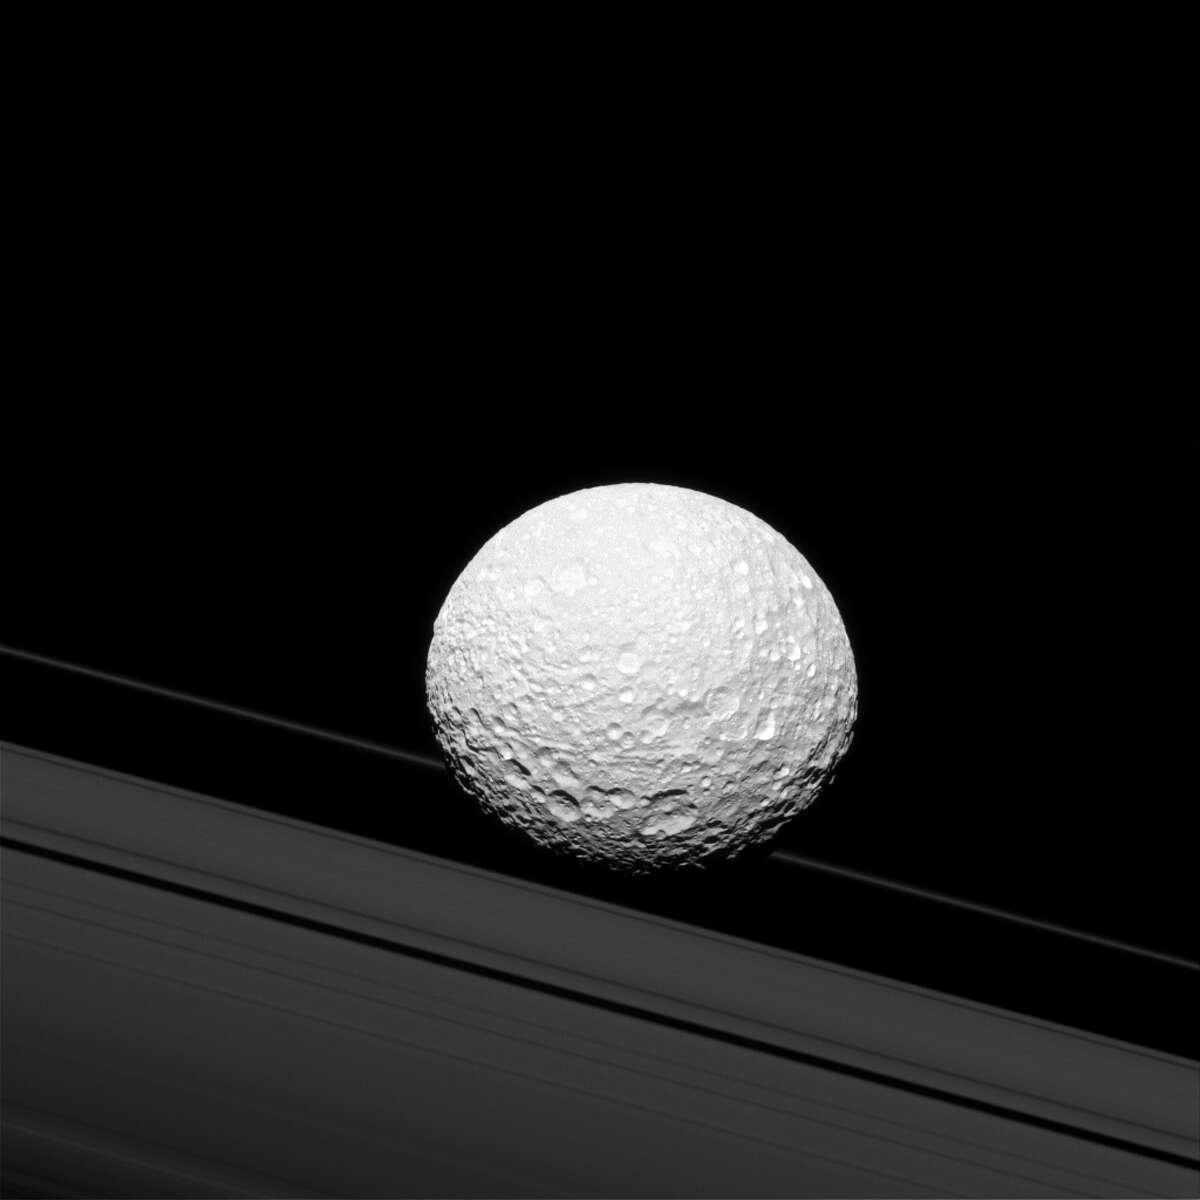 Saturn's moon Mimas Date taken:December 19, 2016